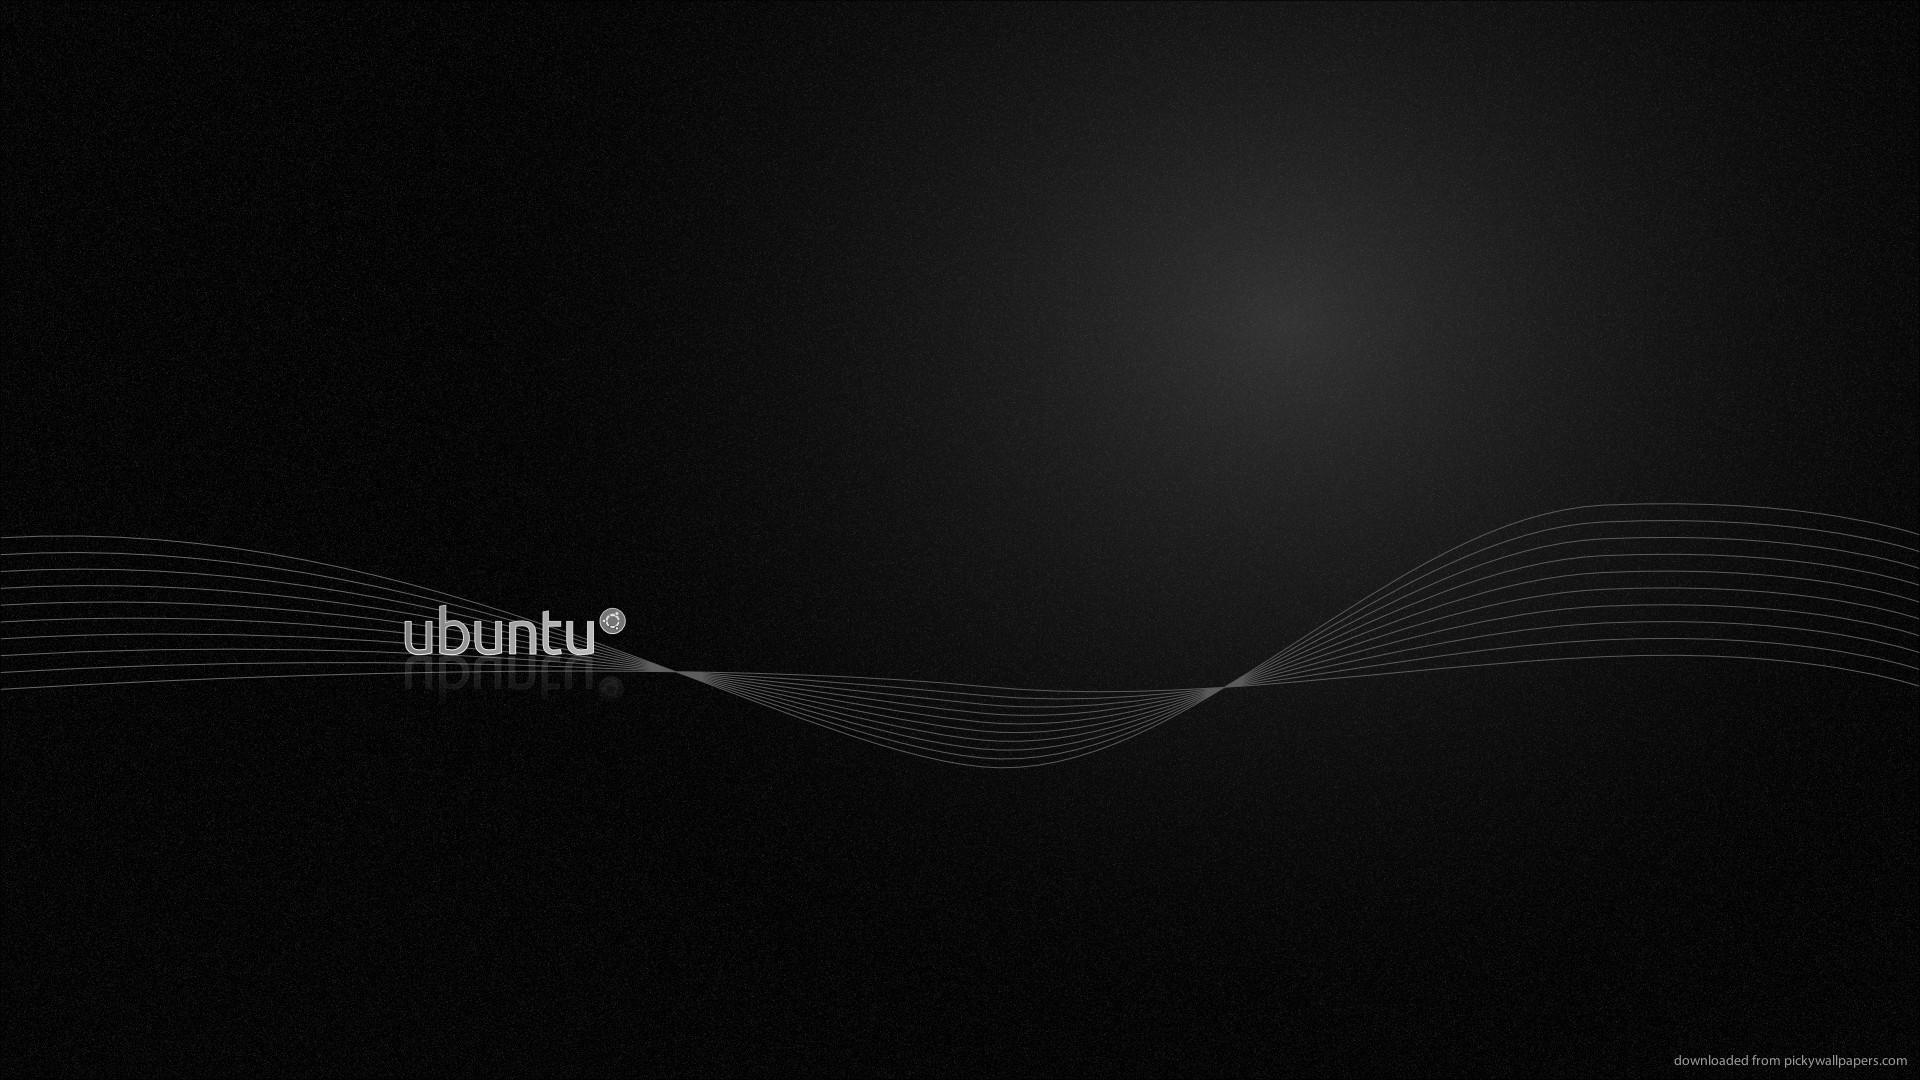 ubuntu black wallpaper computers linux 1920x1080 1920x1080